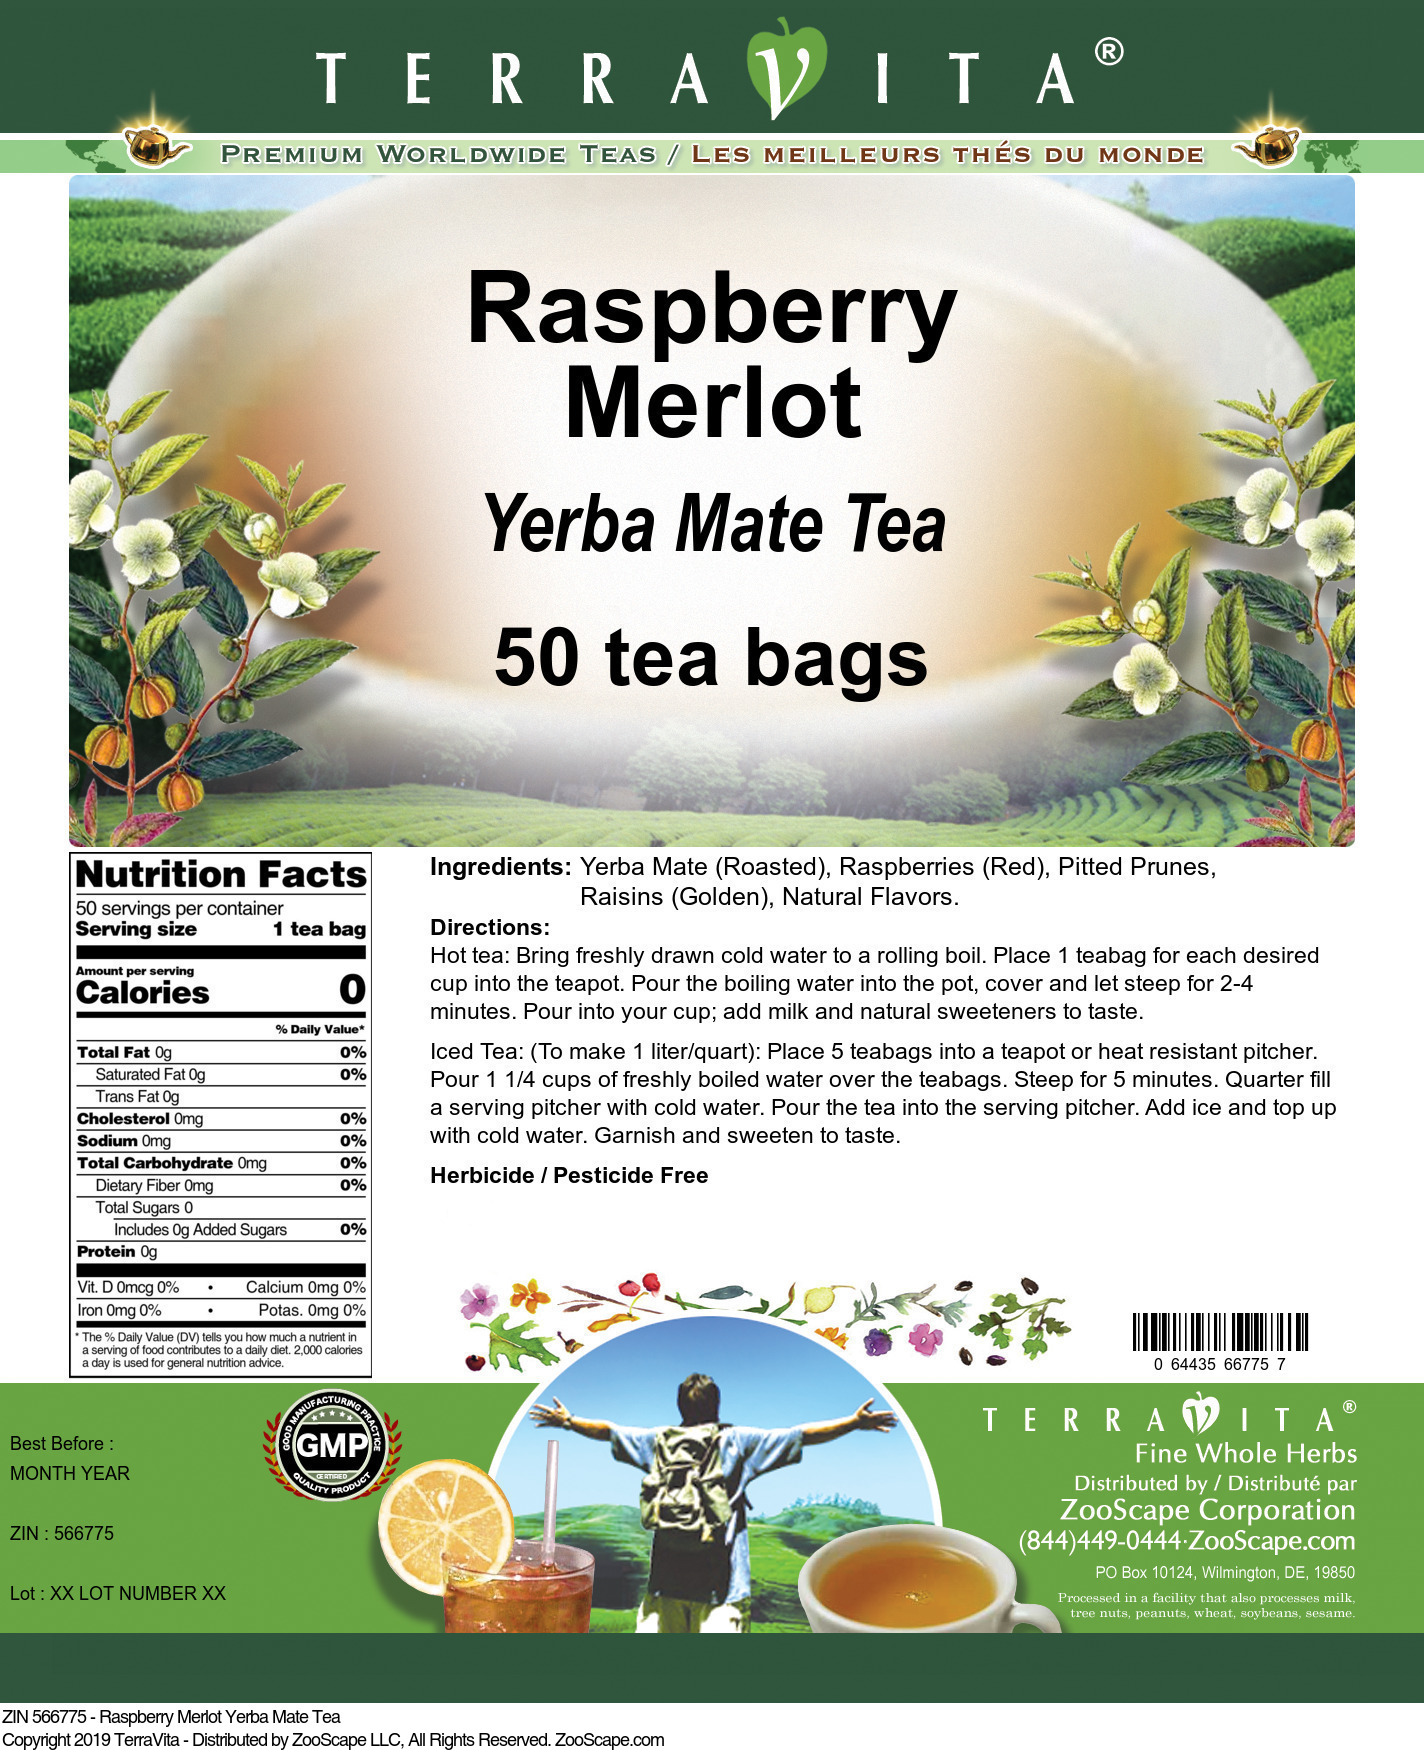 Raspberry Merlot Yerba Mate Tea